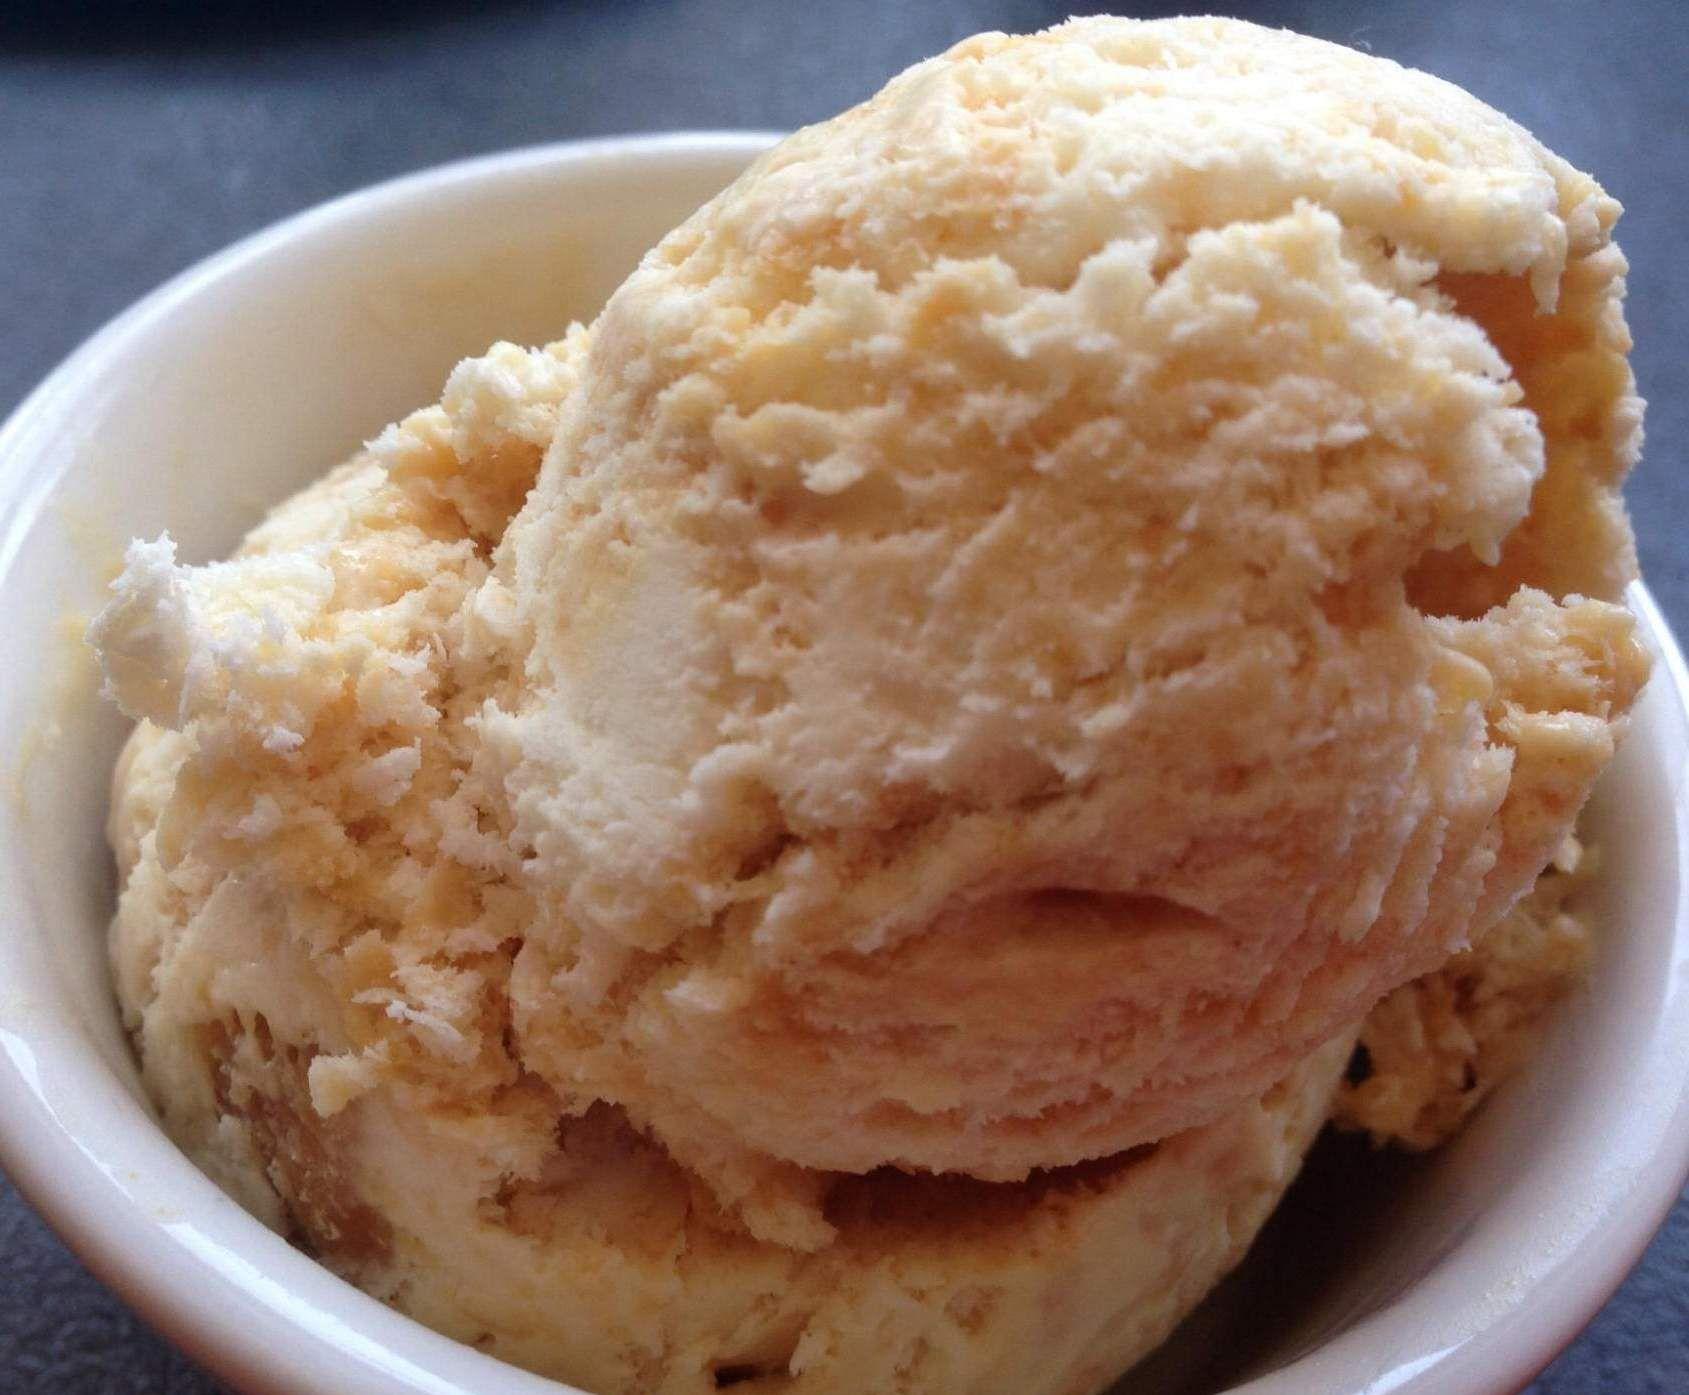 Rezept Karamell Eis von sifi08 - Rezept der Kategorie Desserts